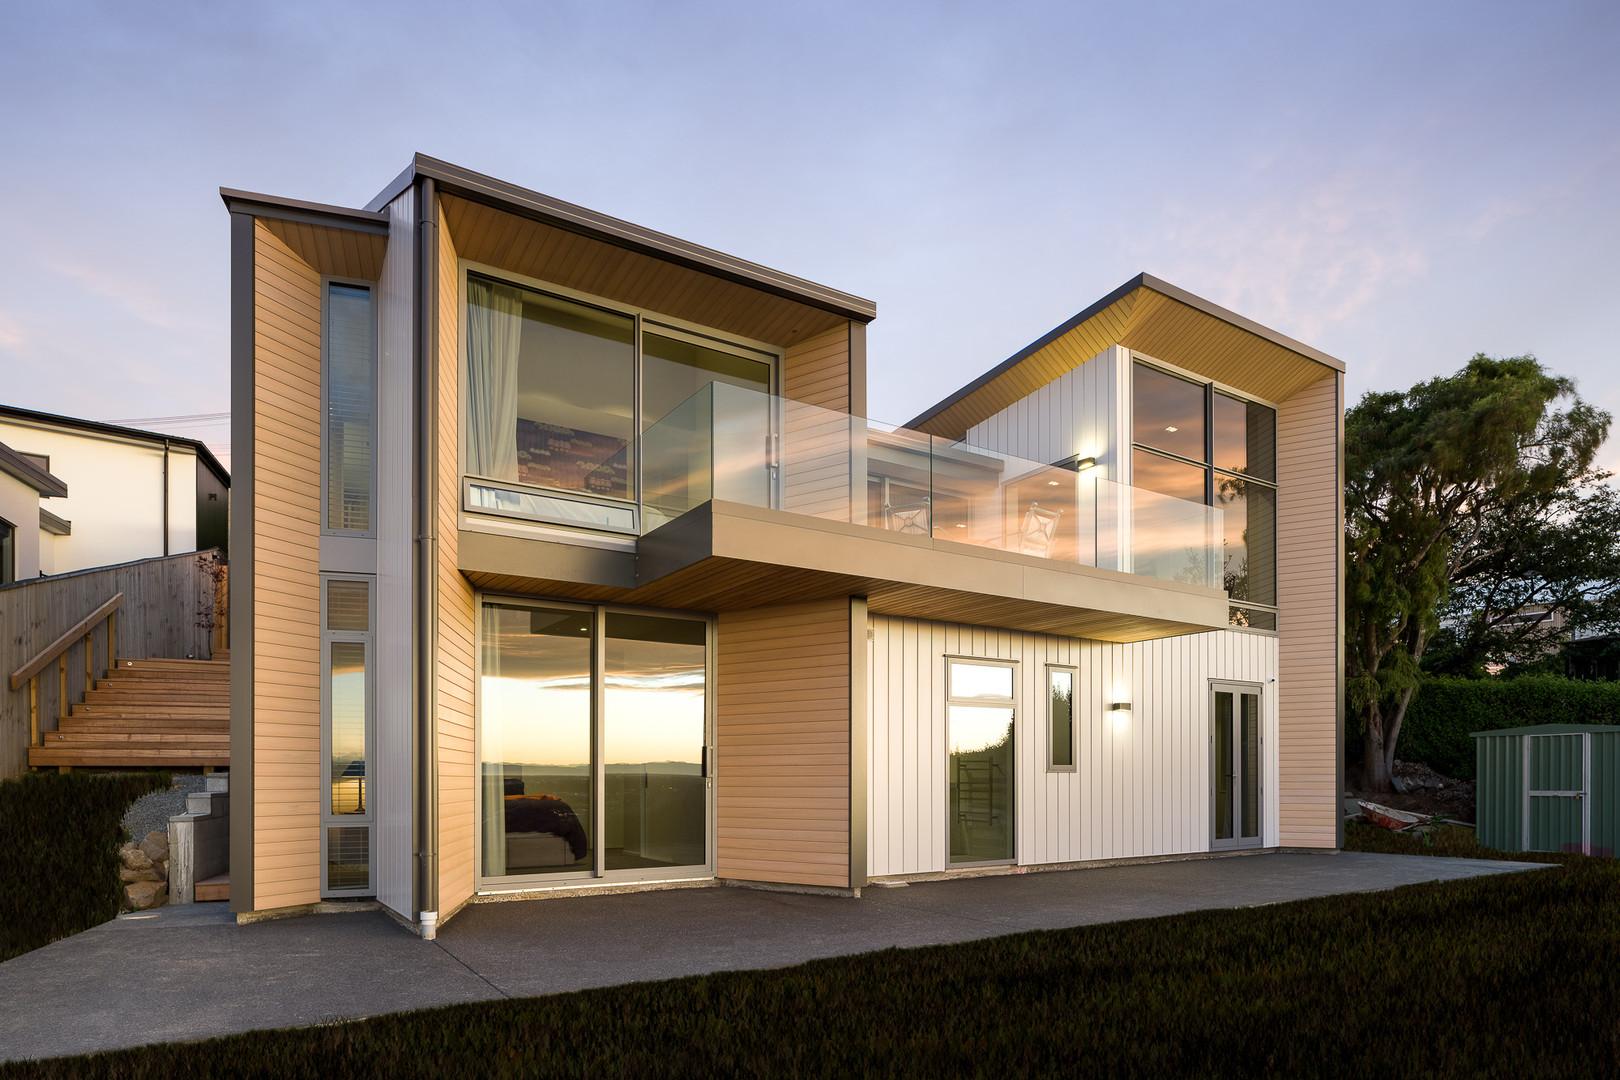 Architectural hillside home